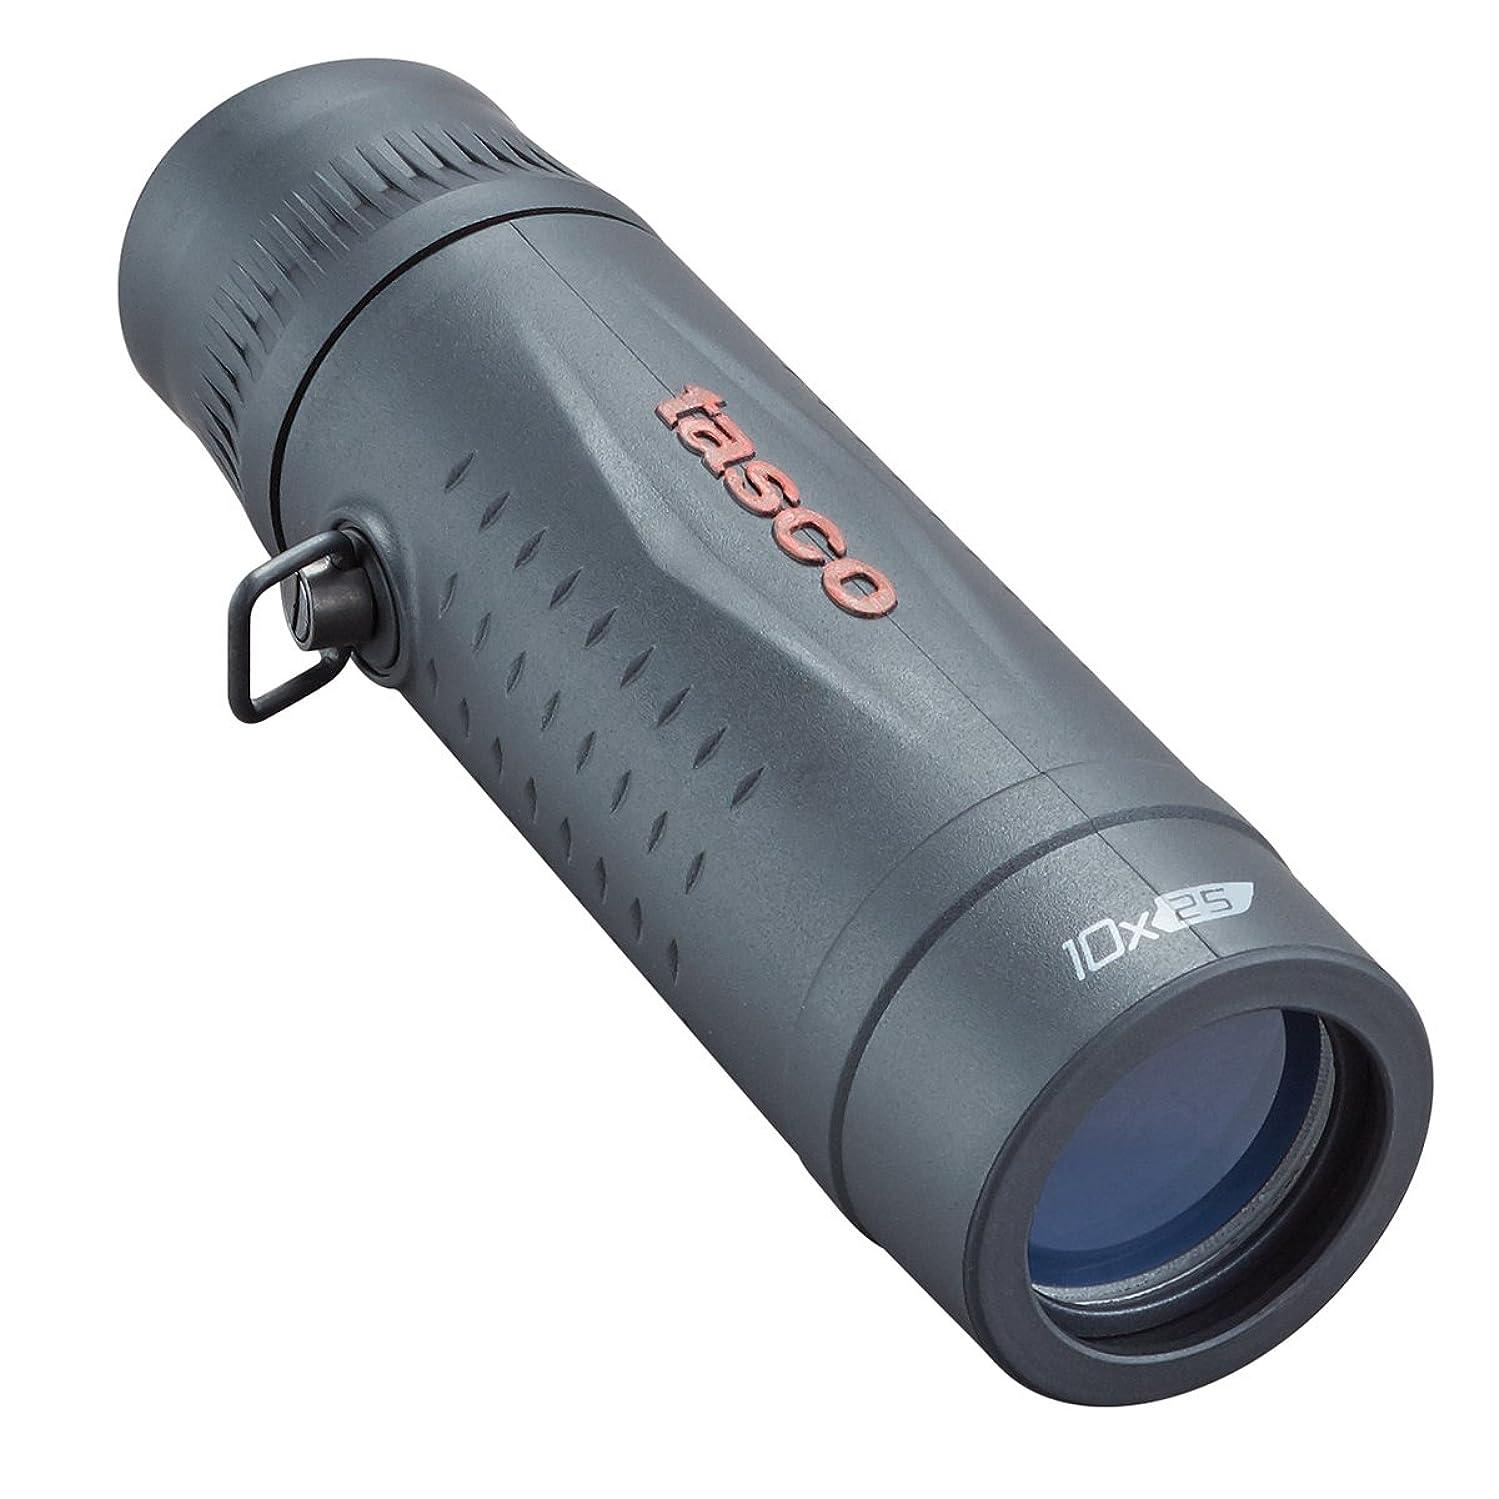 TASCO Essentials Roof MC Box Monocular, 10 x 25mm